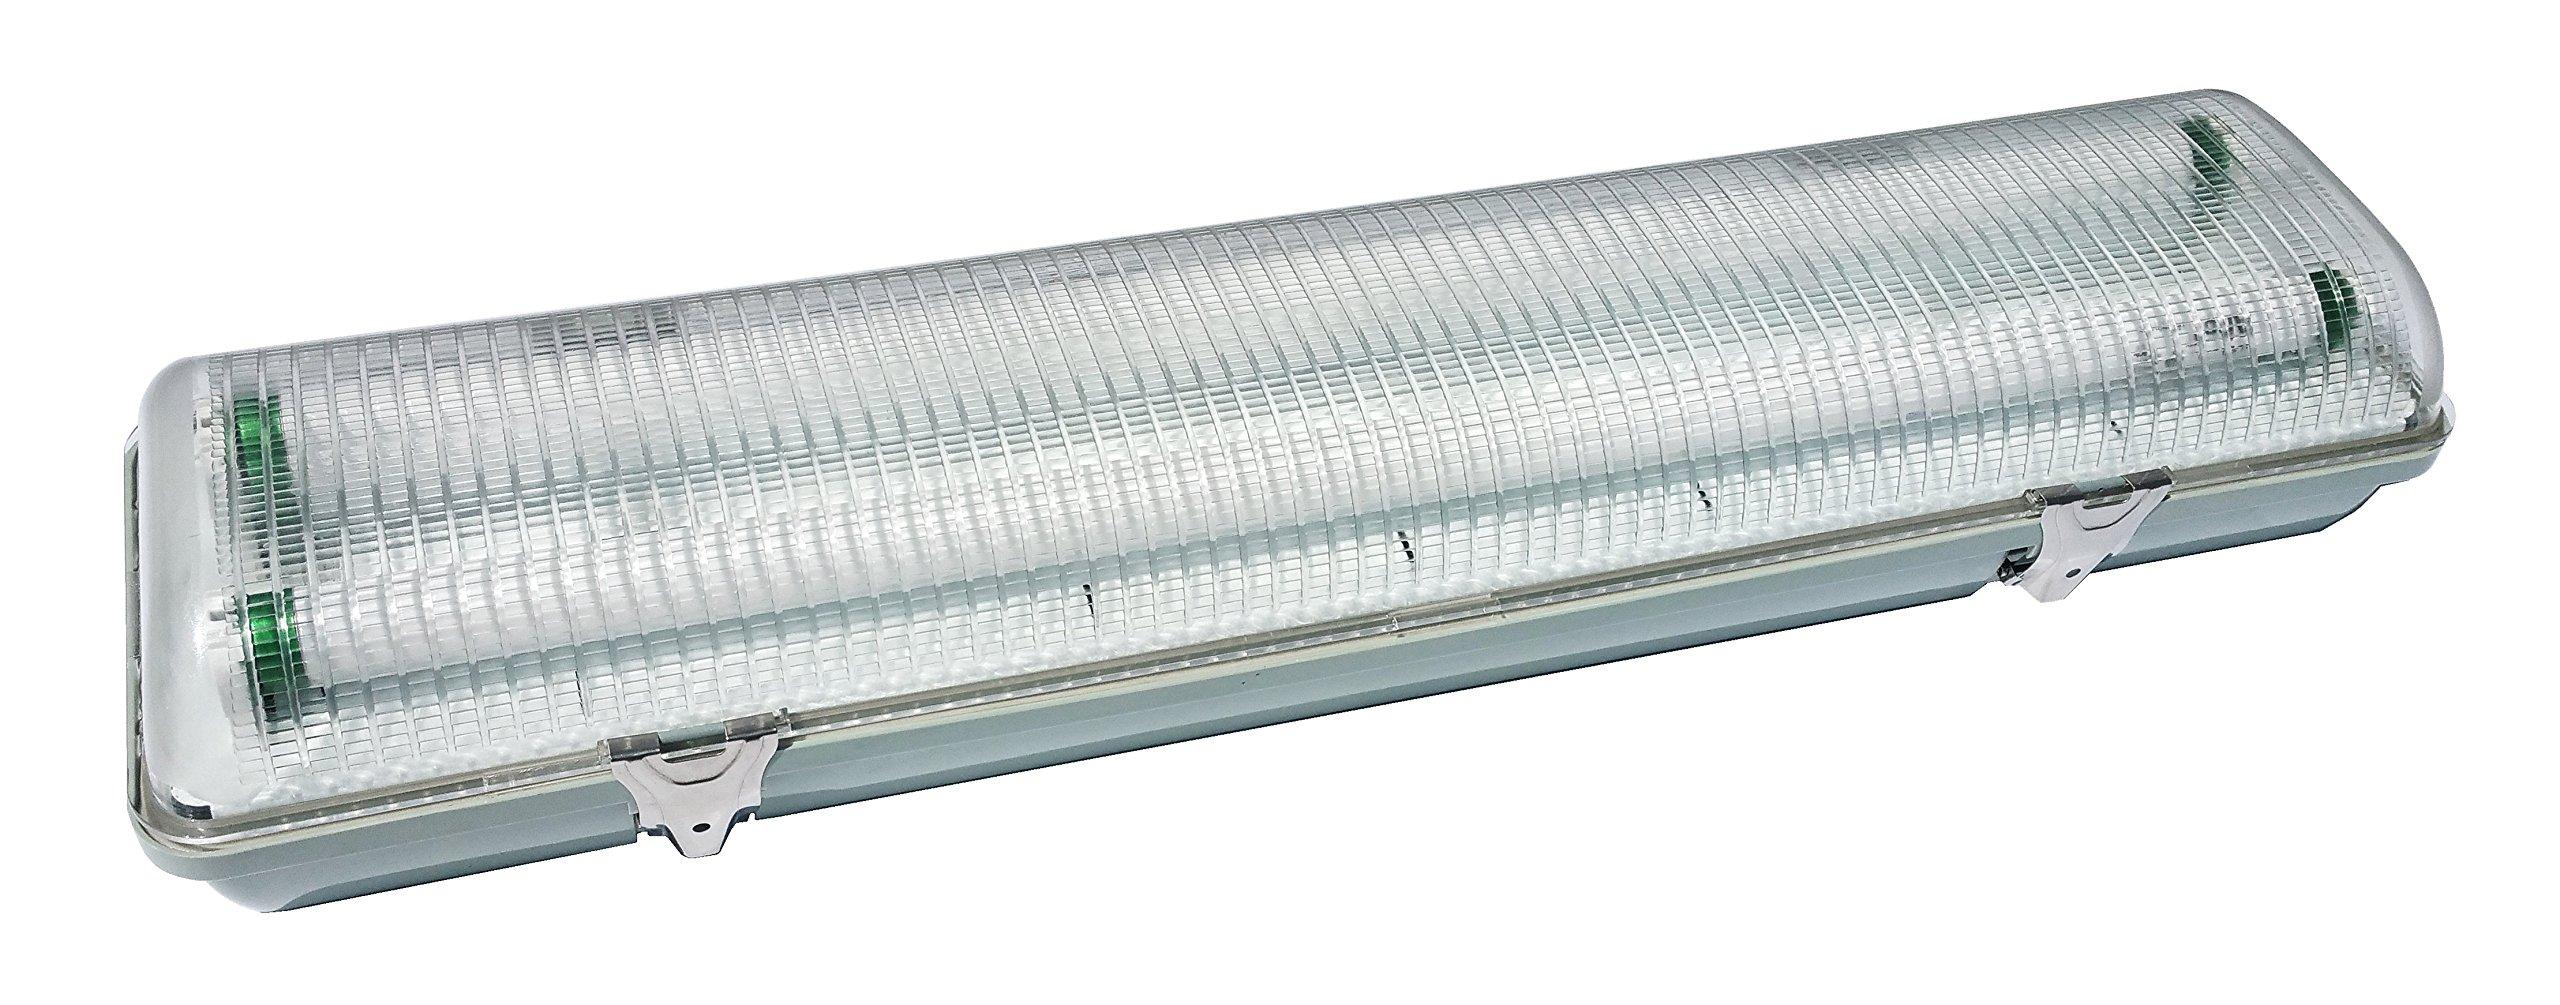 NICOR Lighting 52-Inch 2-Lamp T8 Fluorescent Vaportite Outdoor Light, Gray (20341) by NICOR Lighting